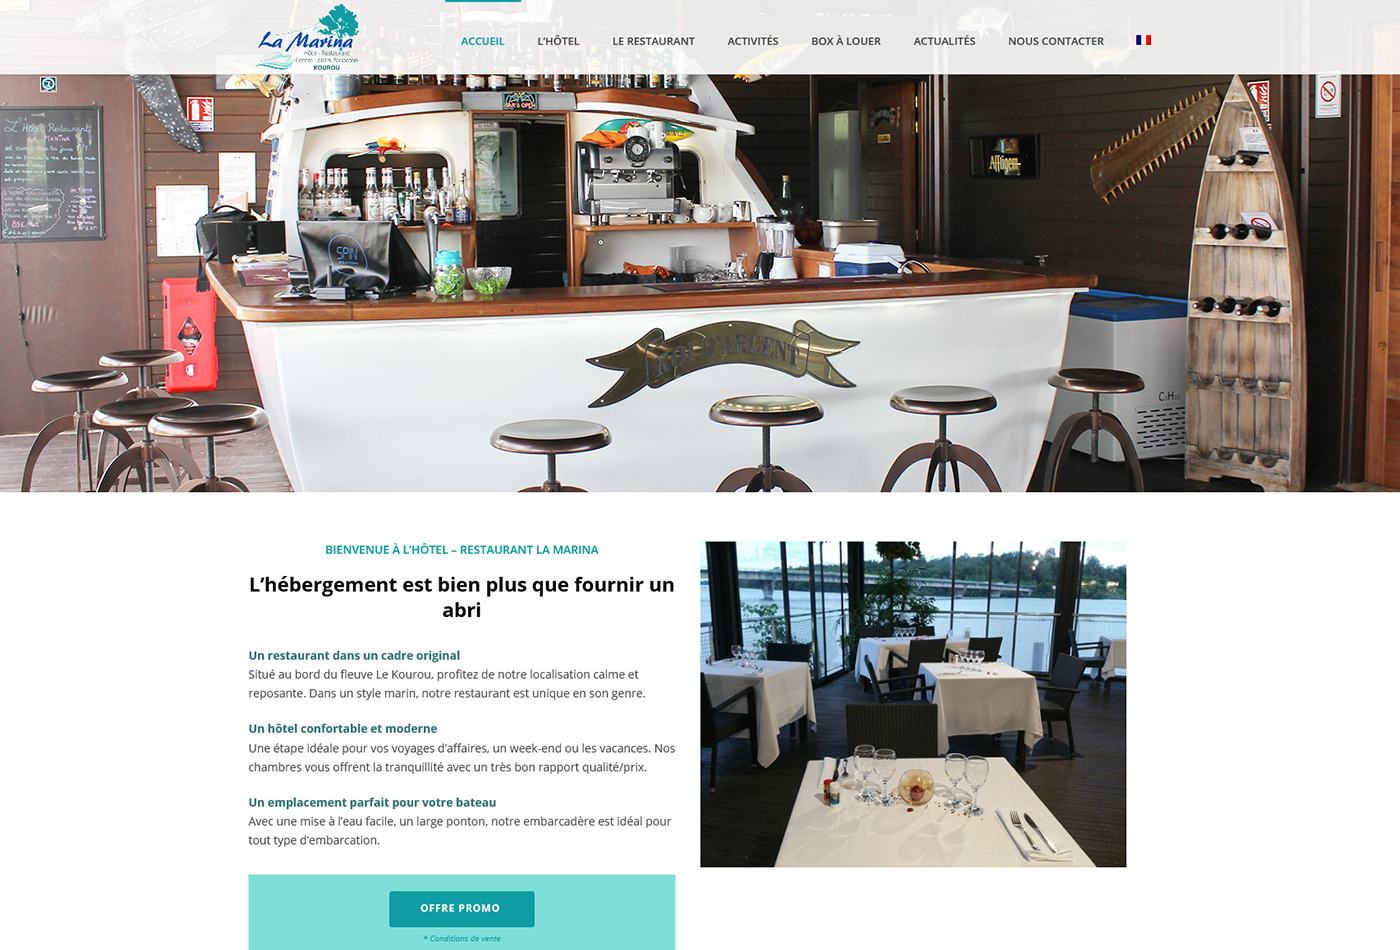 Hotel Restaurant La Marina